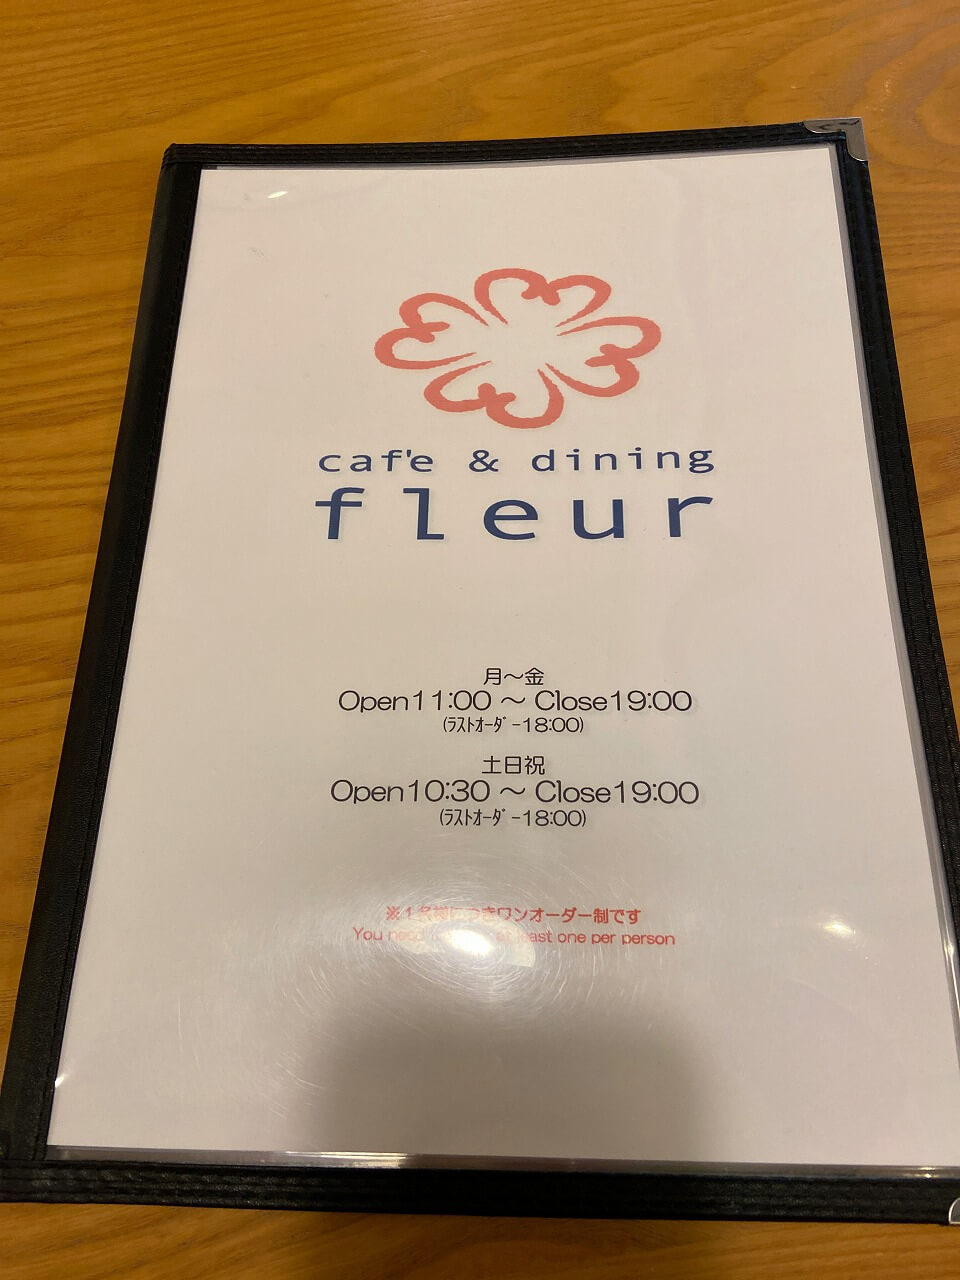 fleur(フルール) メニュー